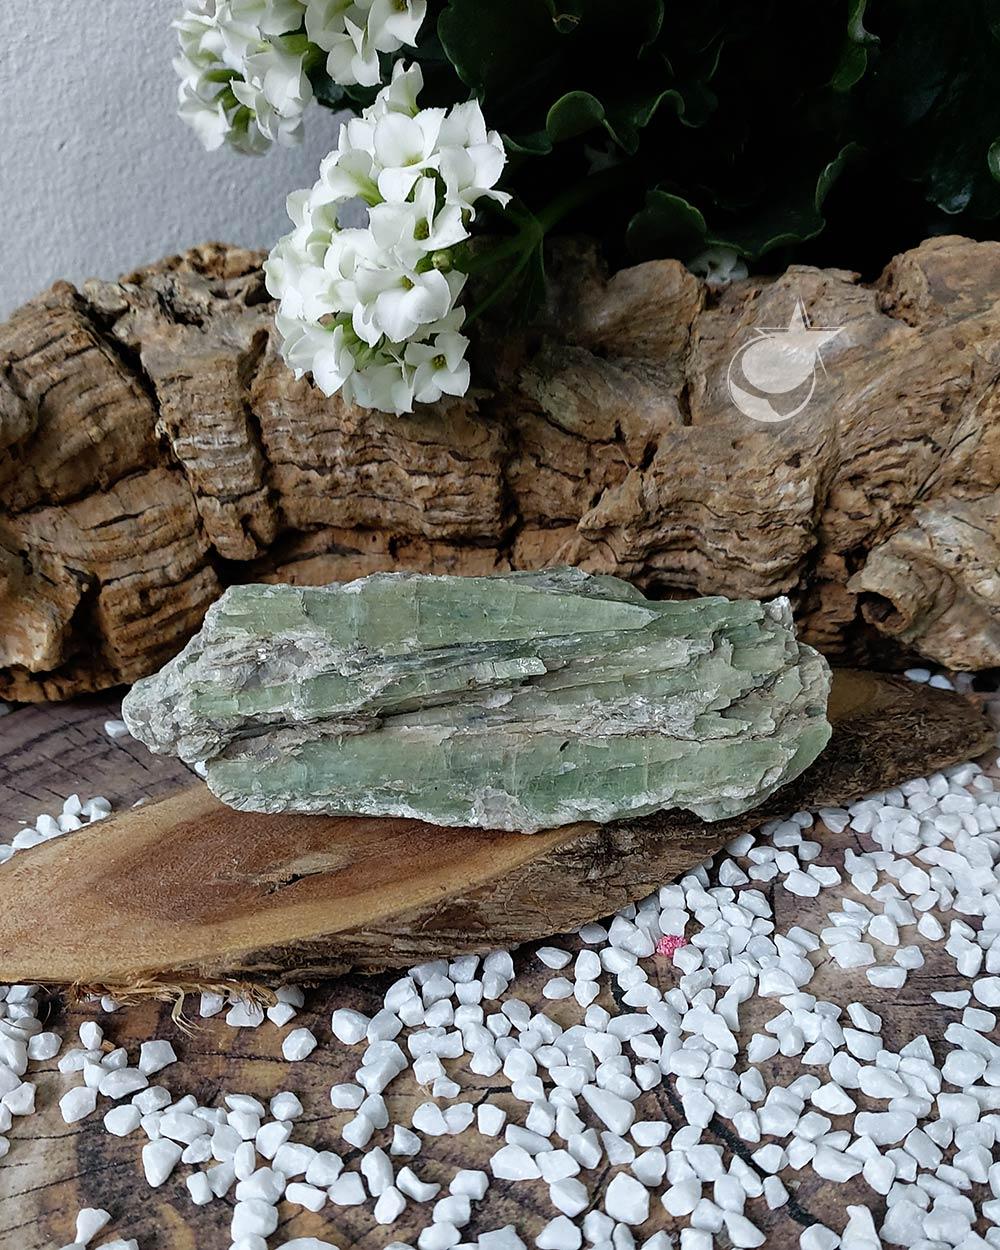 CIANITA VERDE - 13 cm (278g)